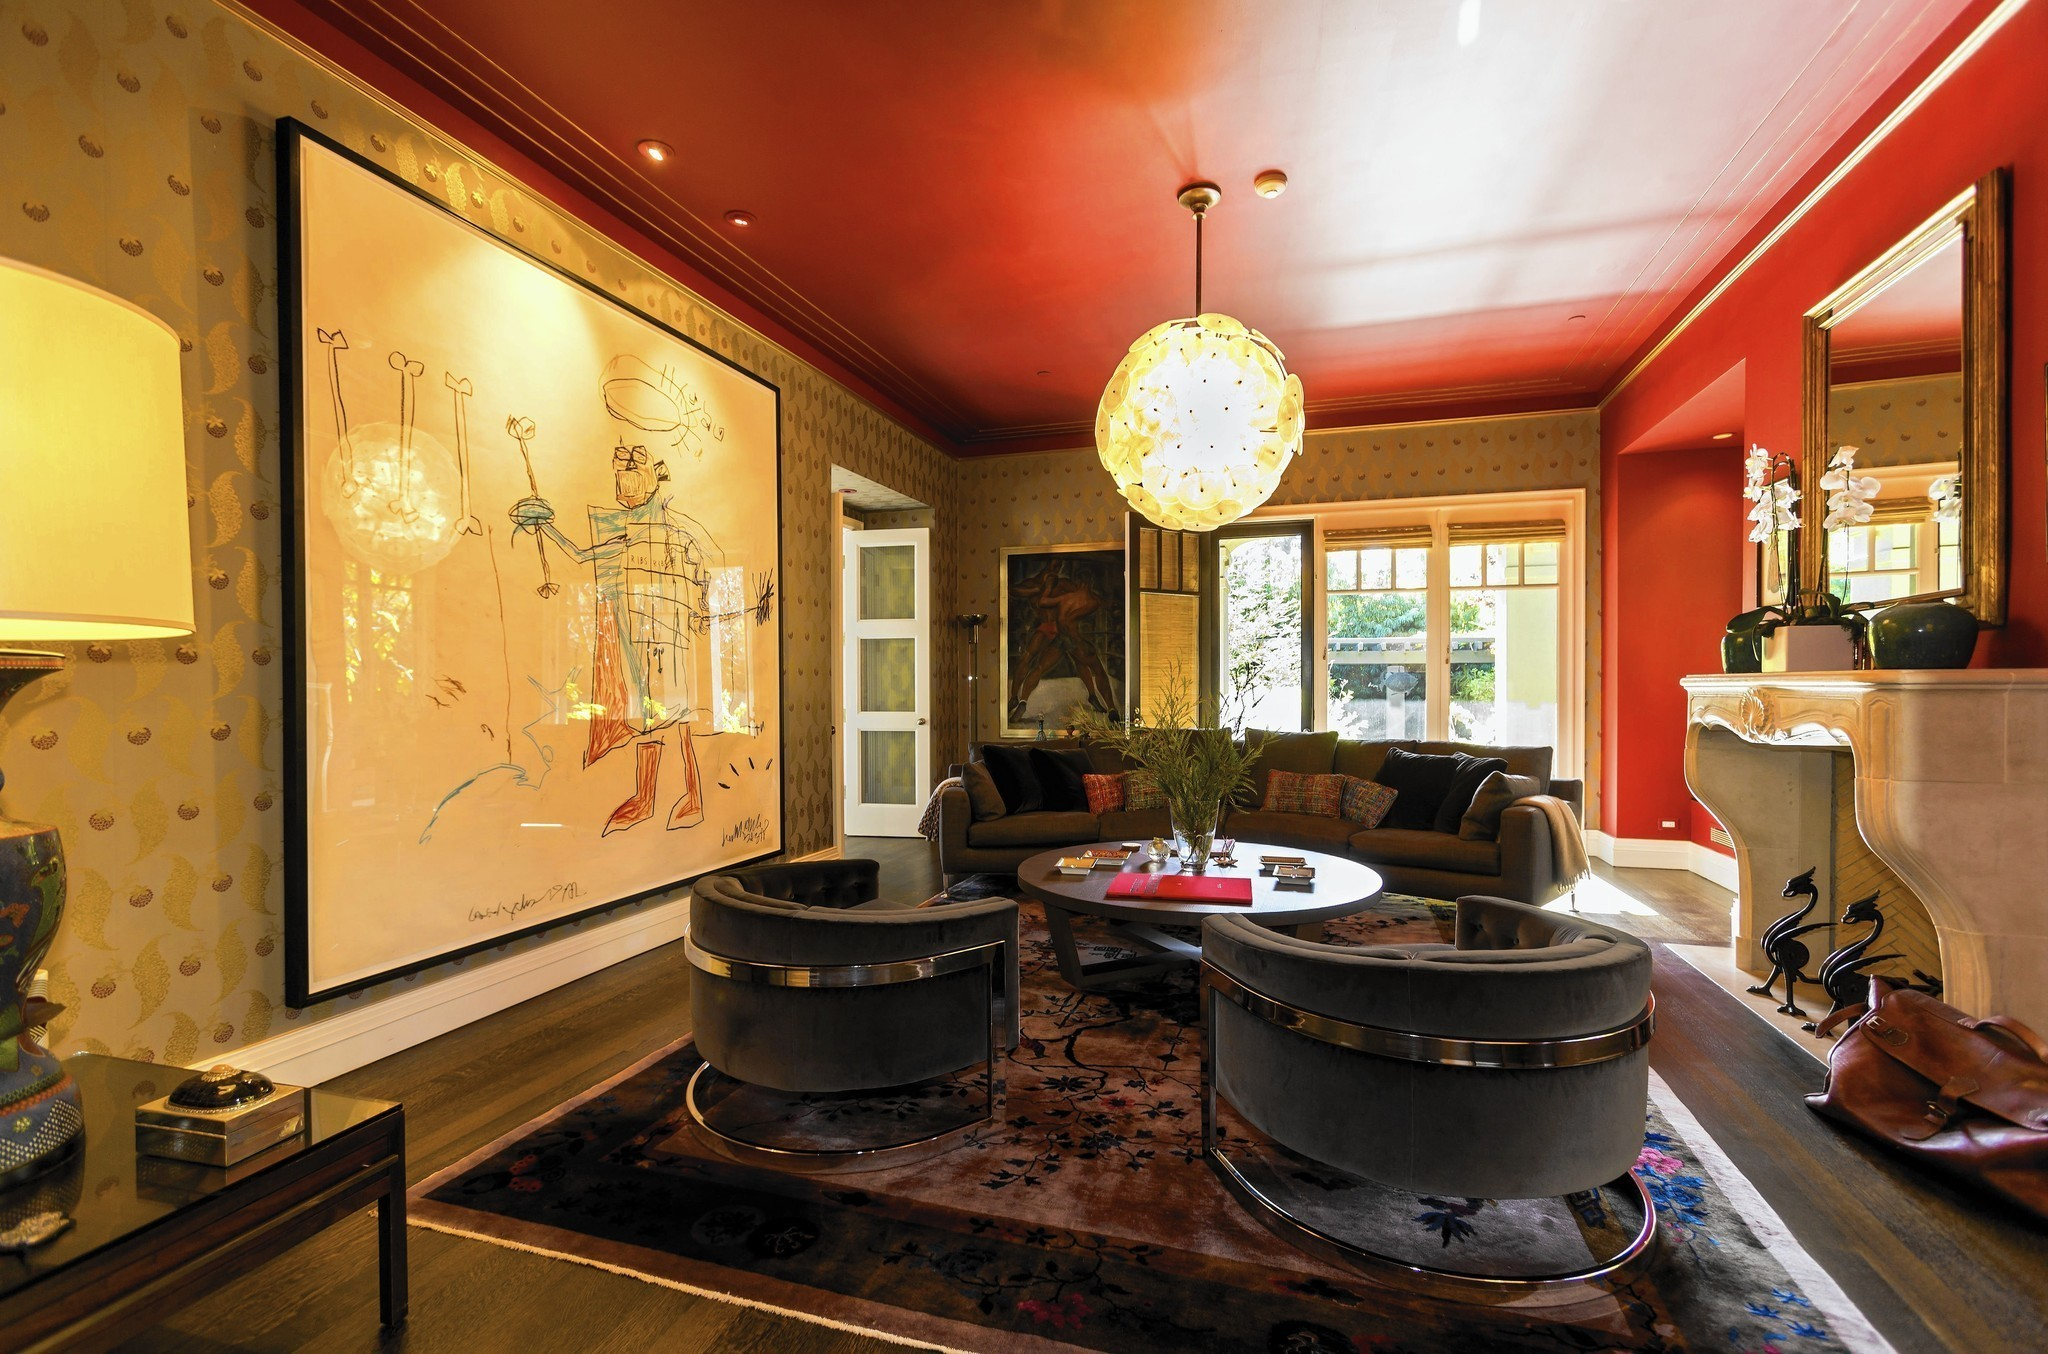 santa monica home of denim executive jerome dahan fuses style art